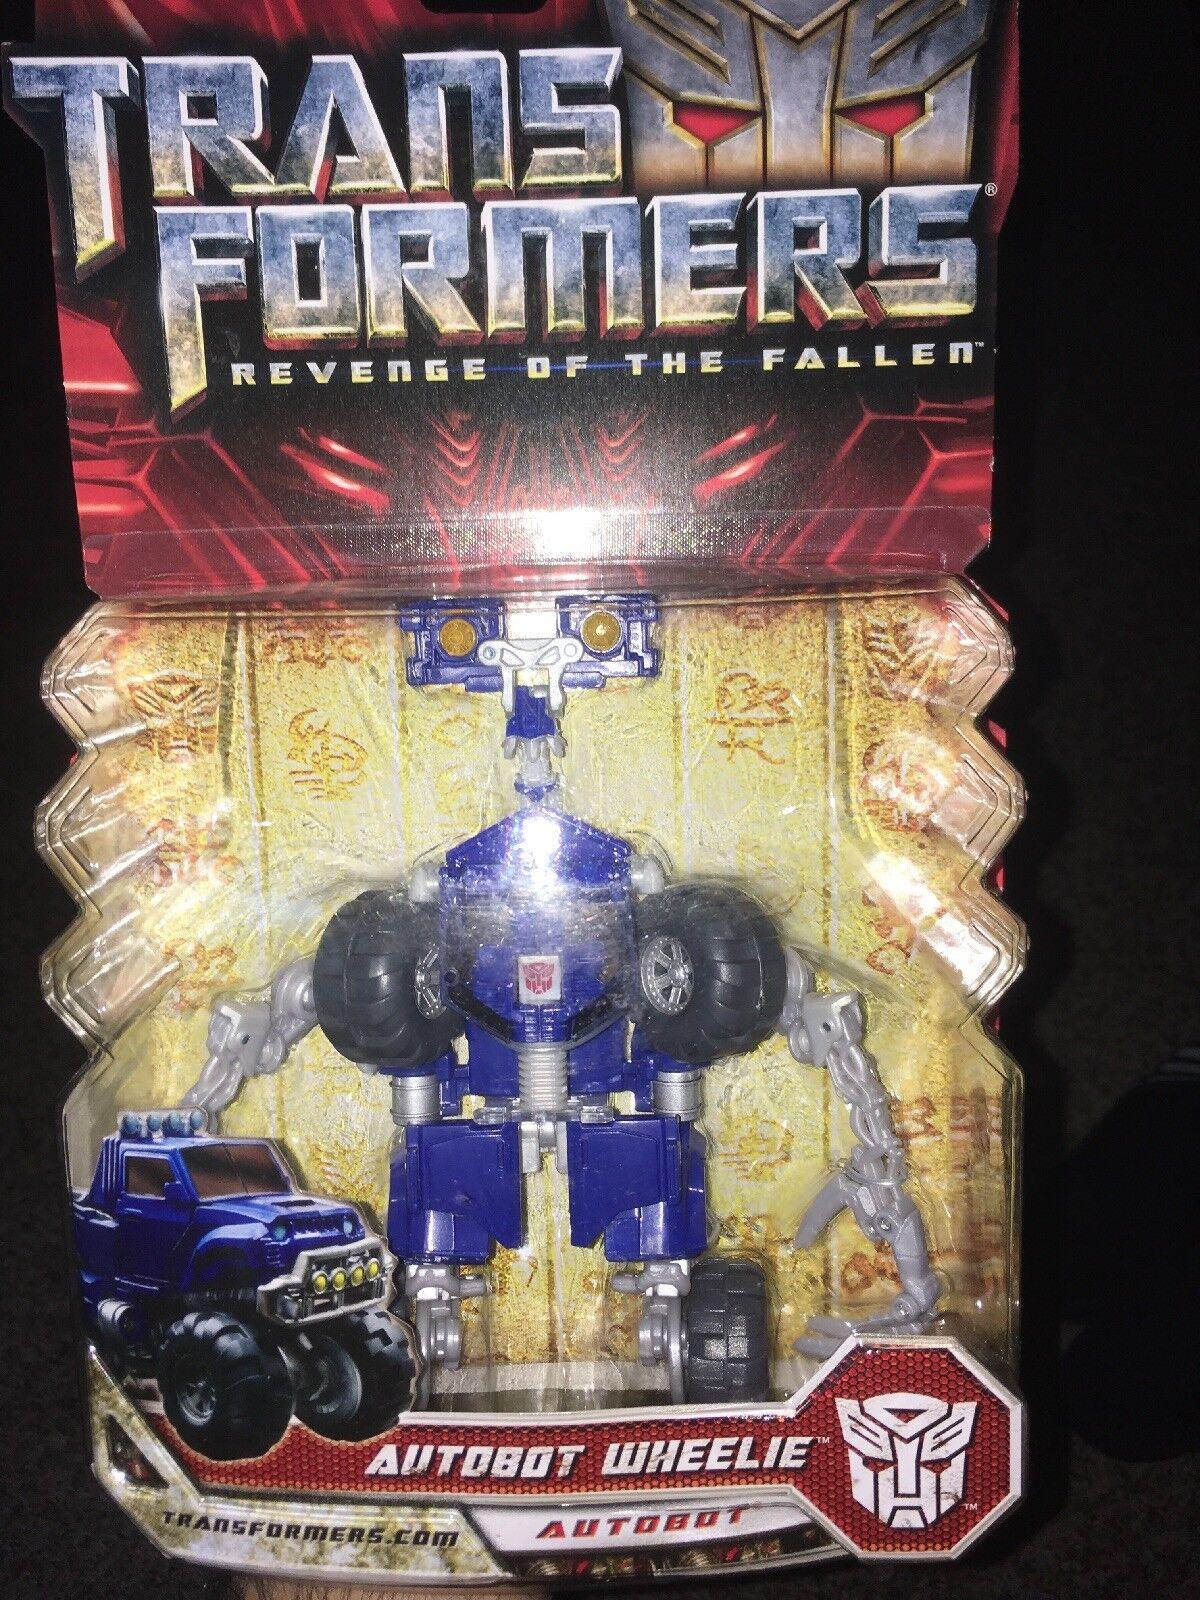 Transformers Revenge Of The Fallen Deluxe Carbot Wheelie MISB 2009 Hasbro